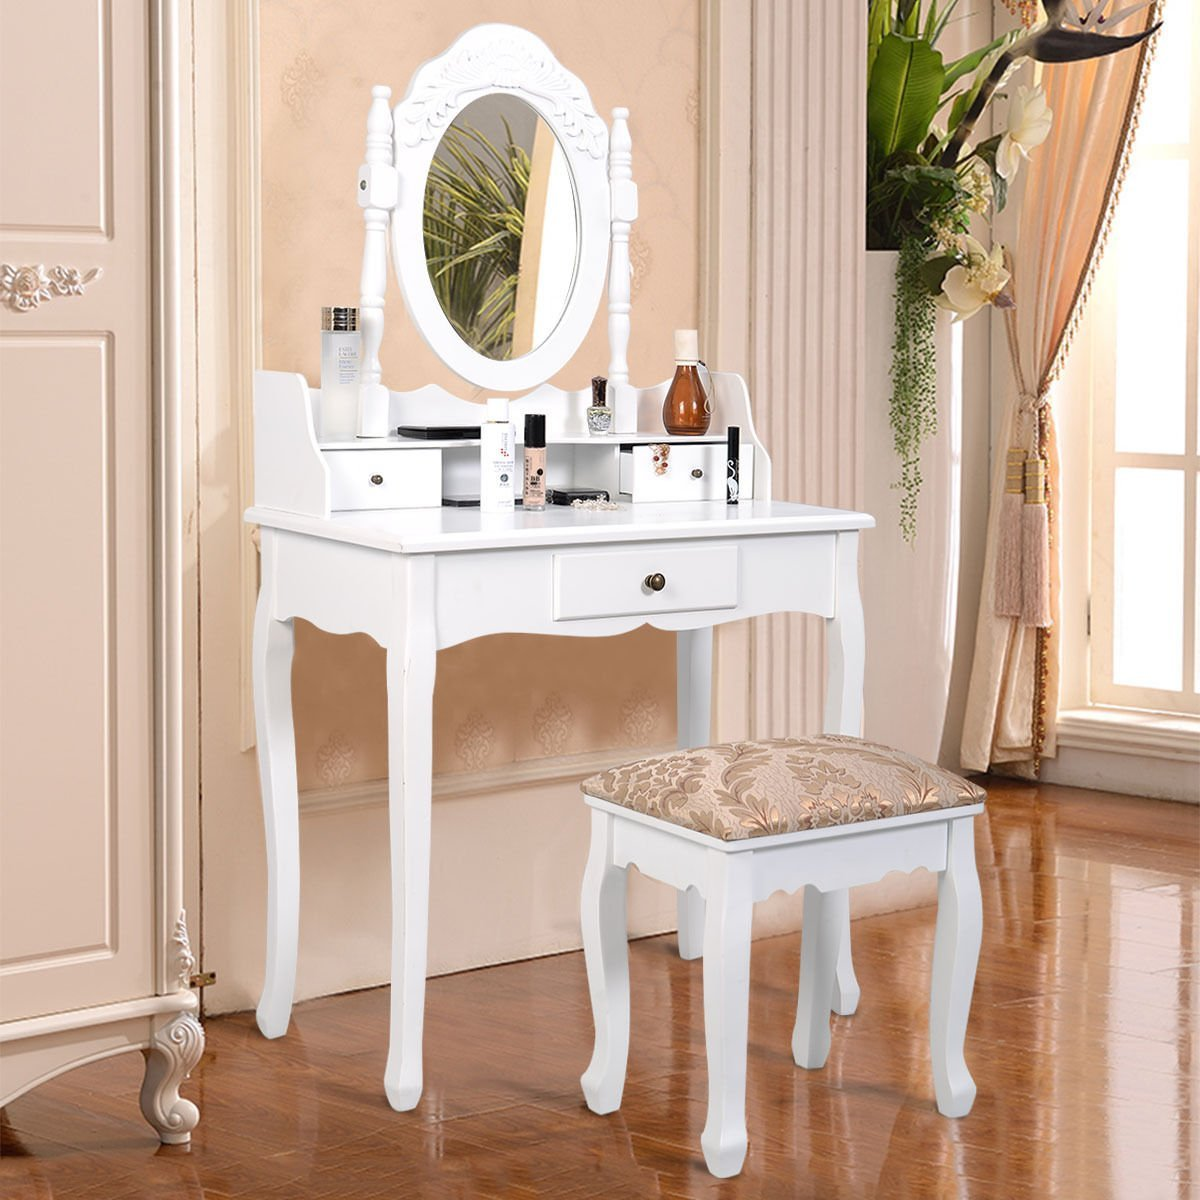 Mascarello®Vanity Table Jewelry Makeup Desk Bench Dresser w/ Stool 3 Drawer White